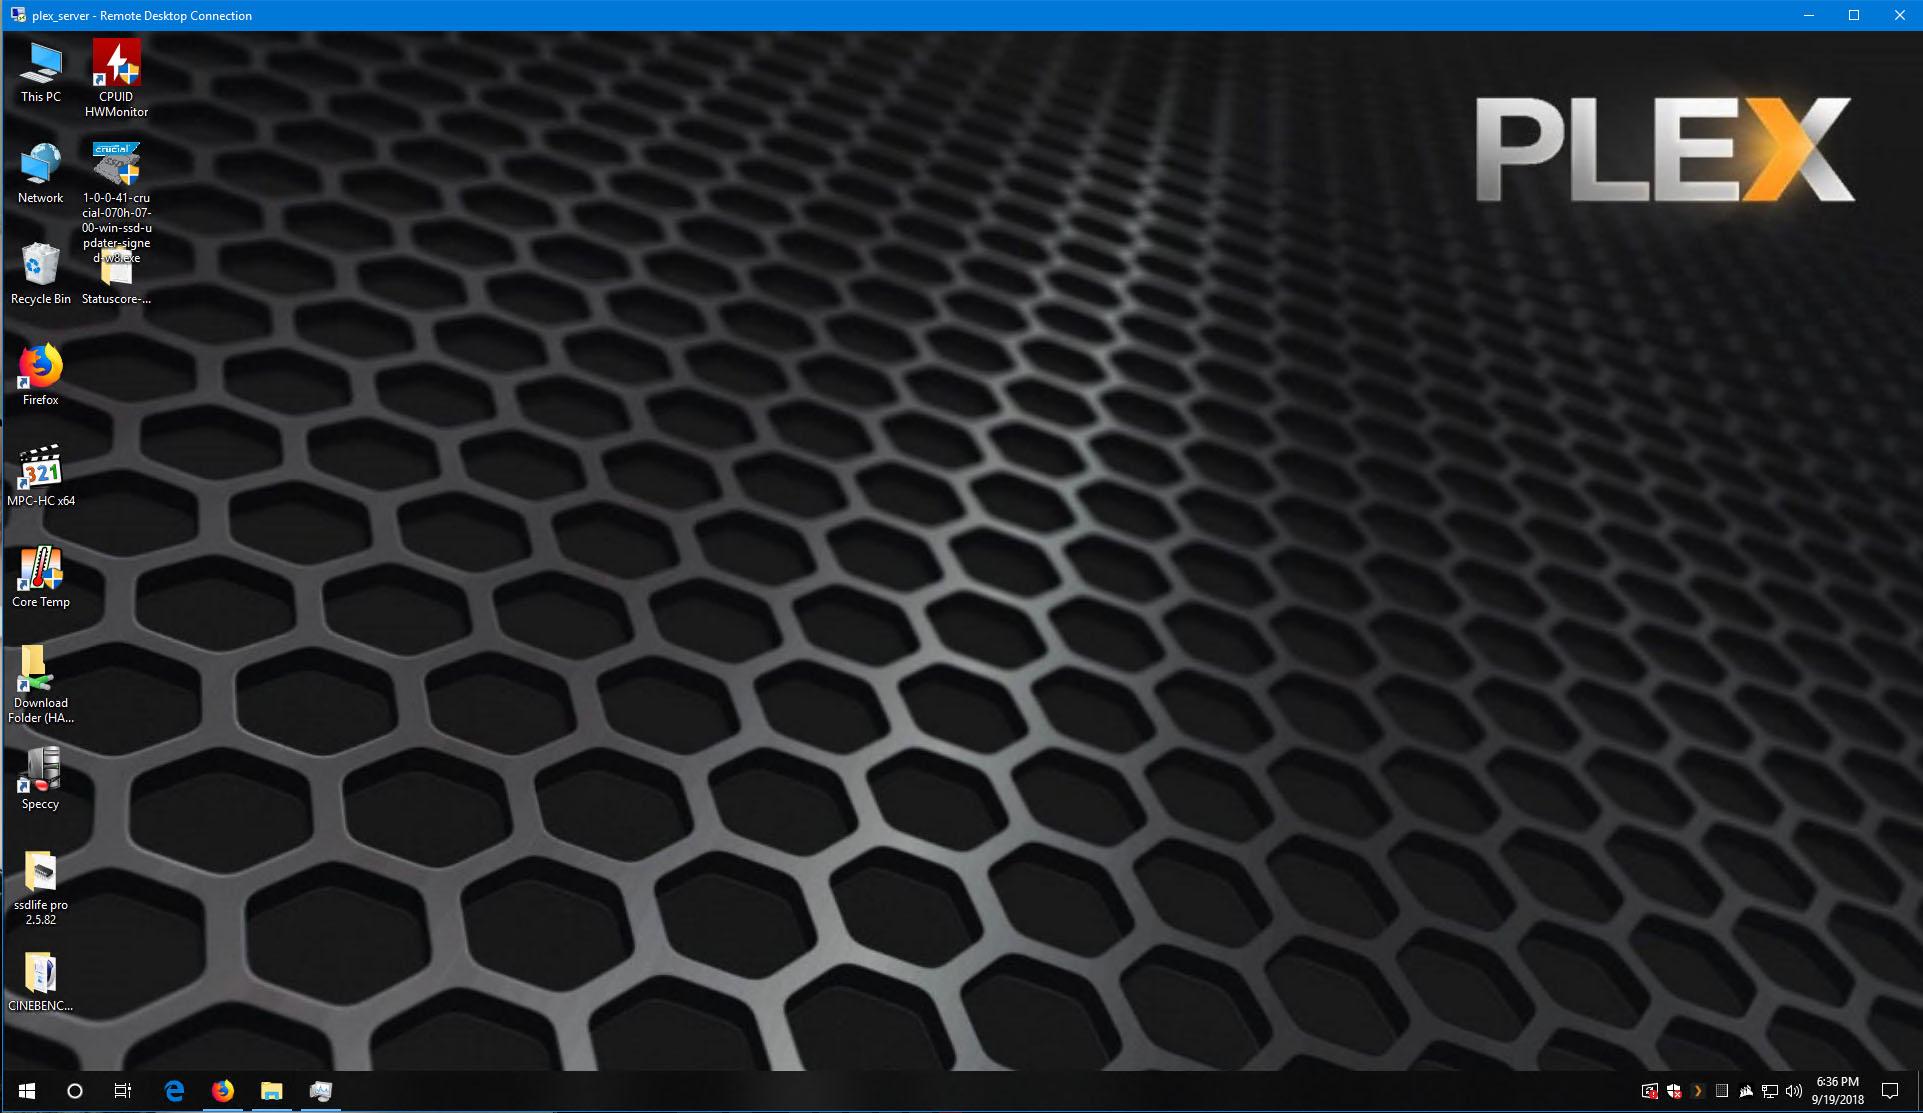 Plex-desktop.jpg